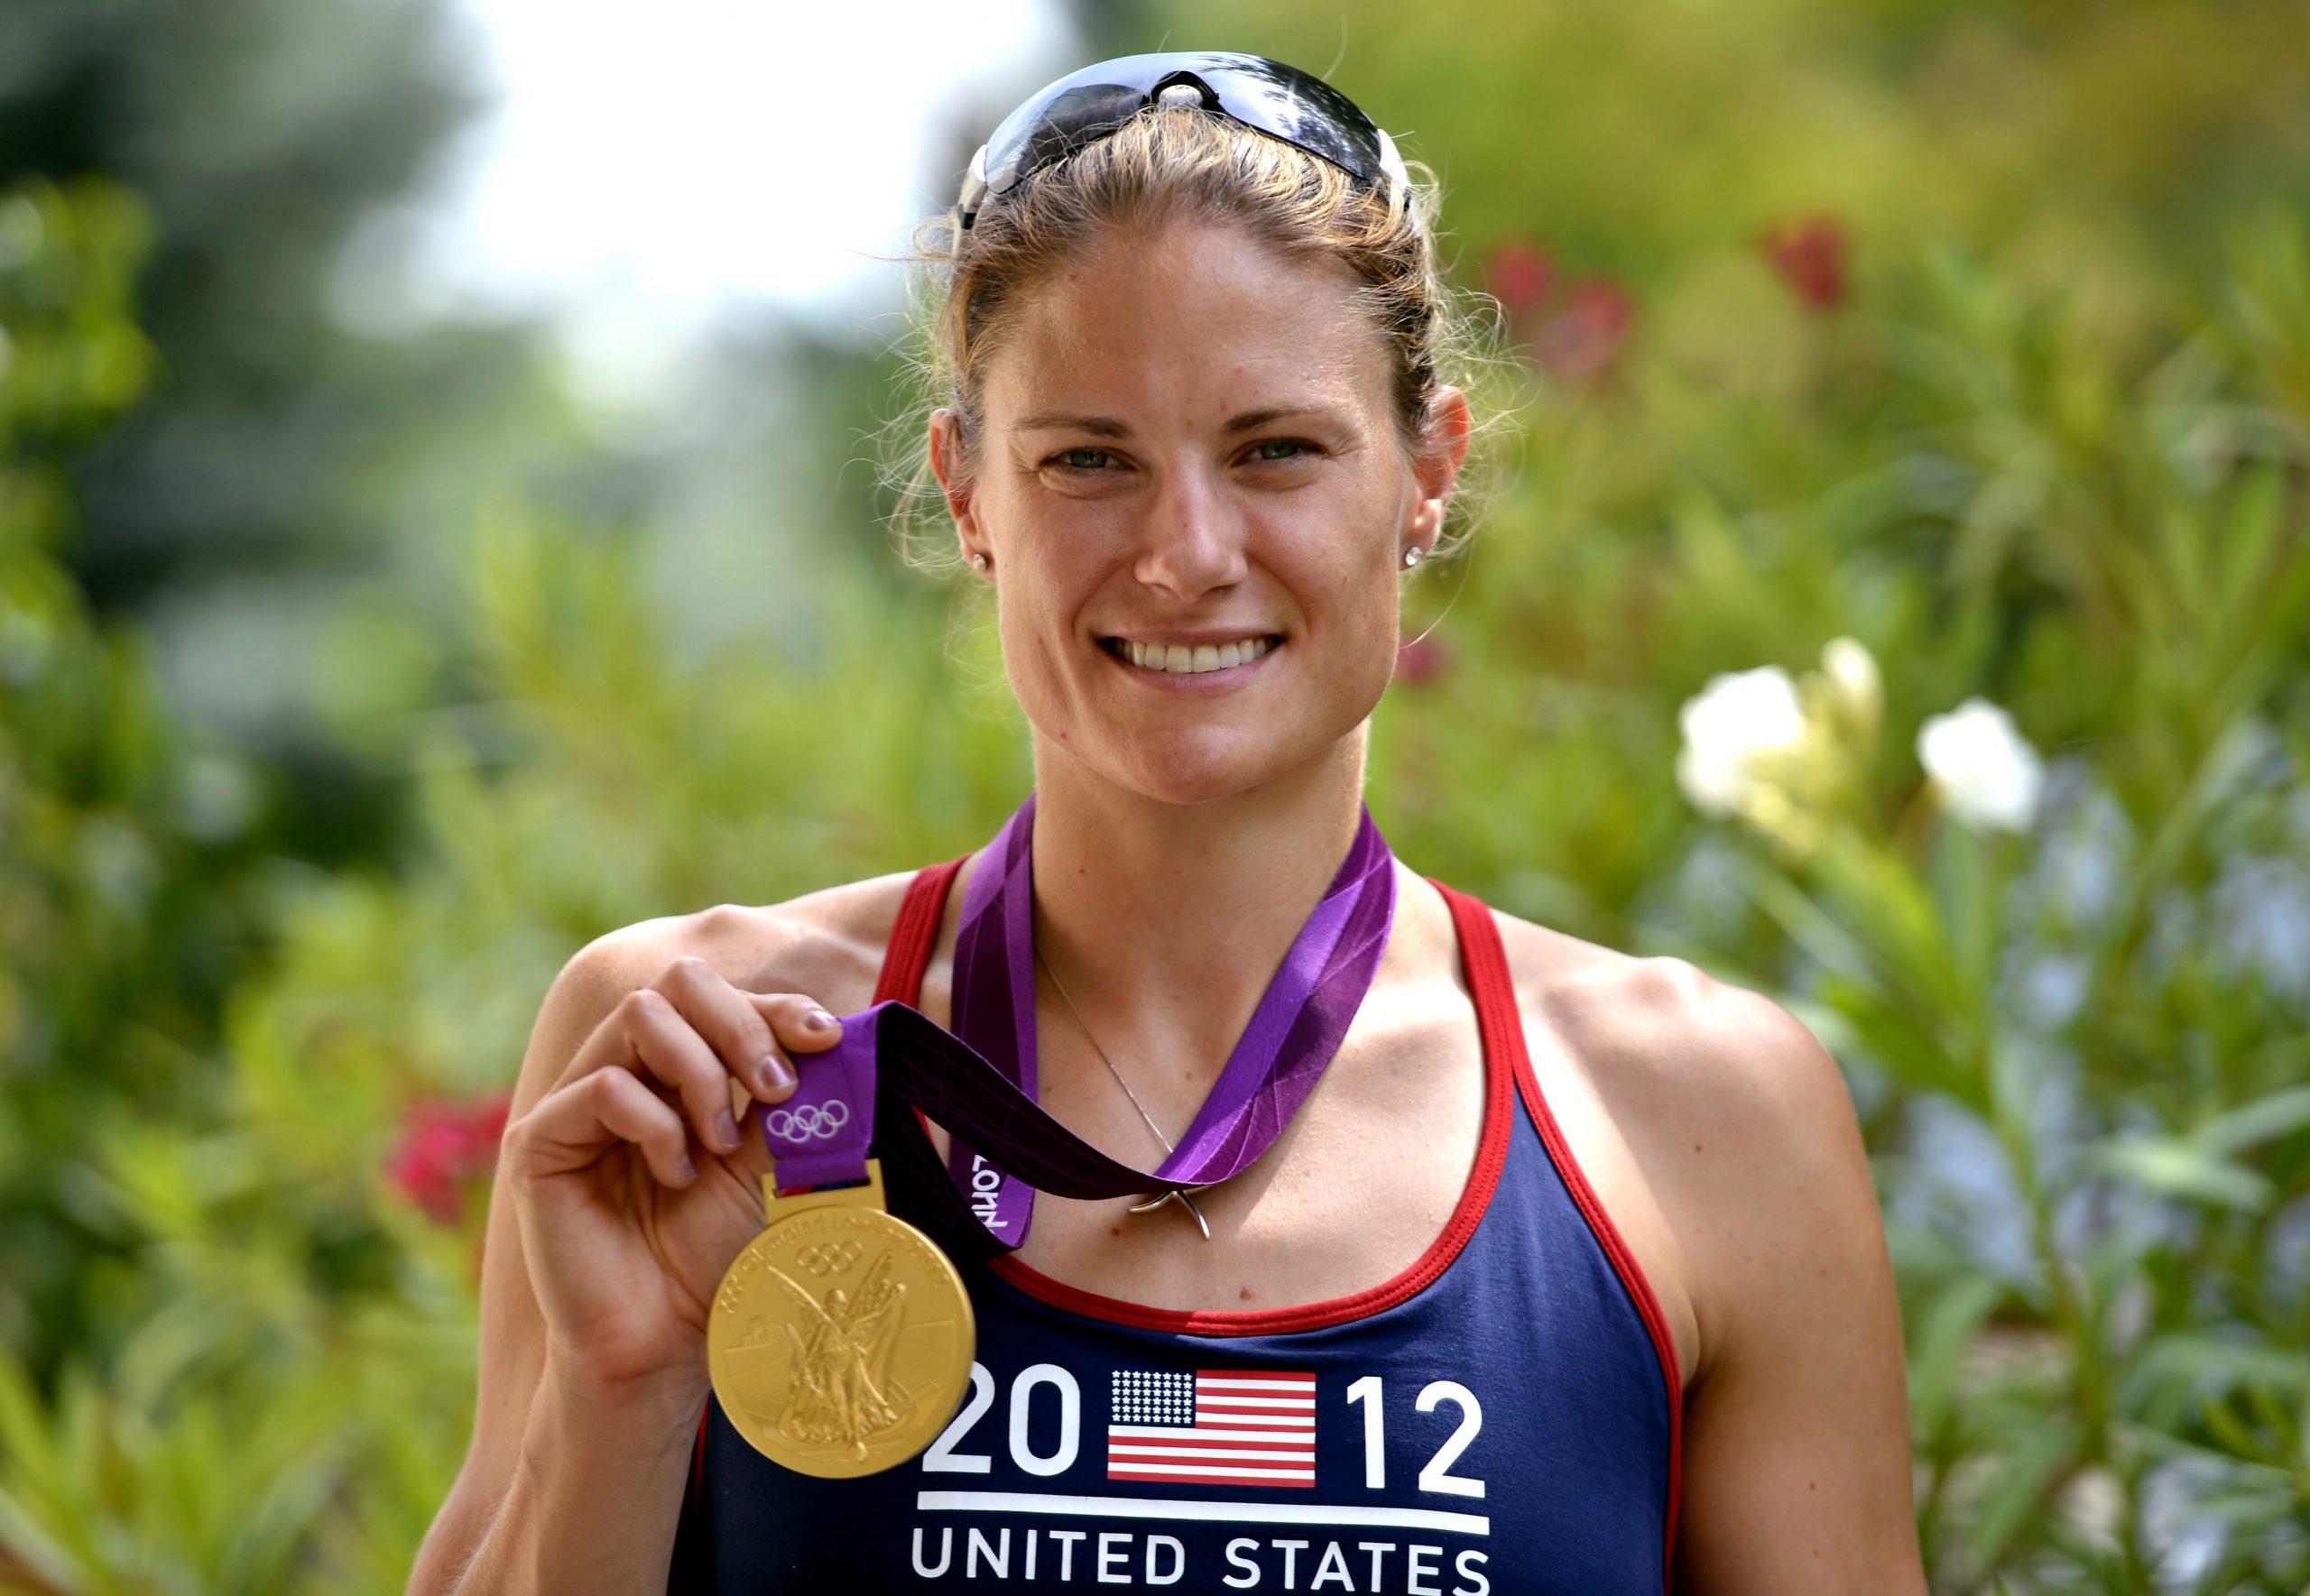 Daughter of Hungarian Coronavirus Vaccine Scientist is US Olympic Gold Medalist